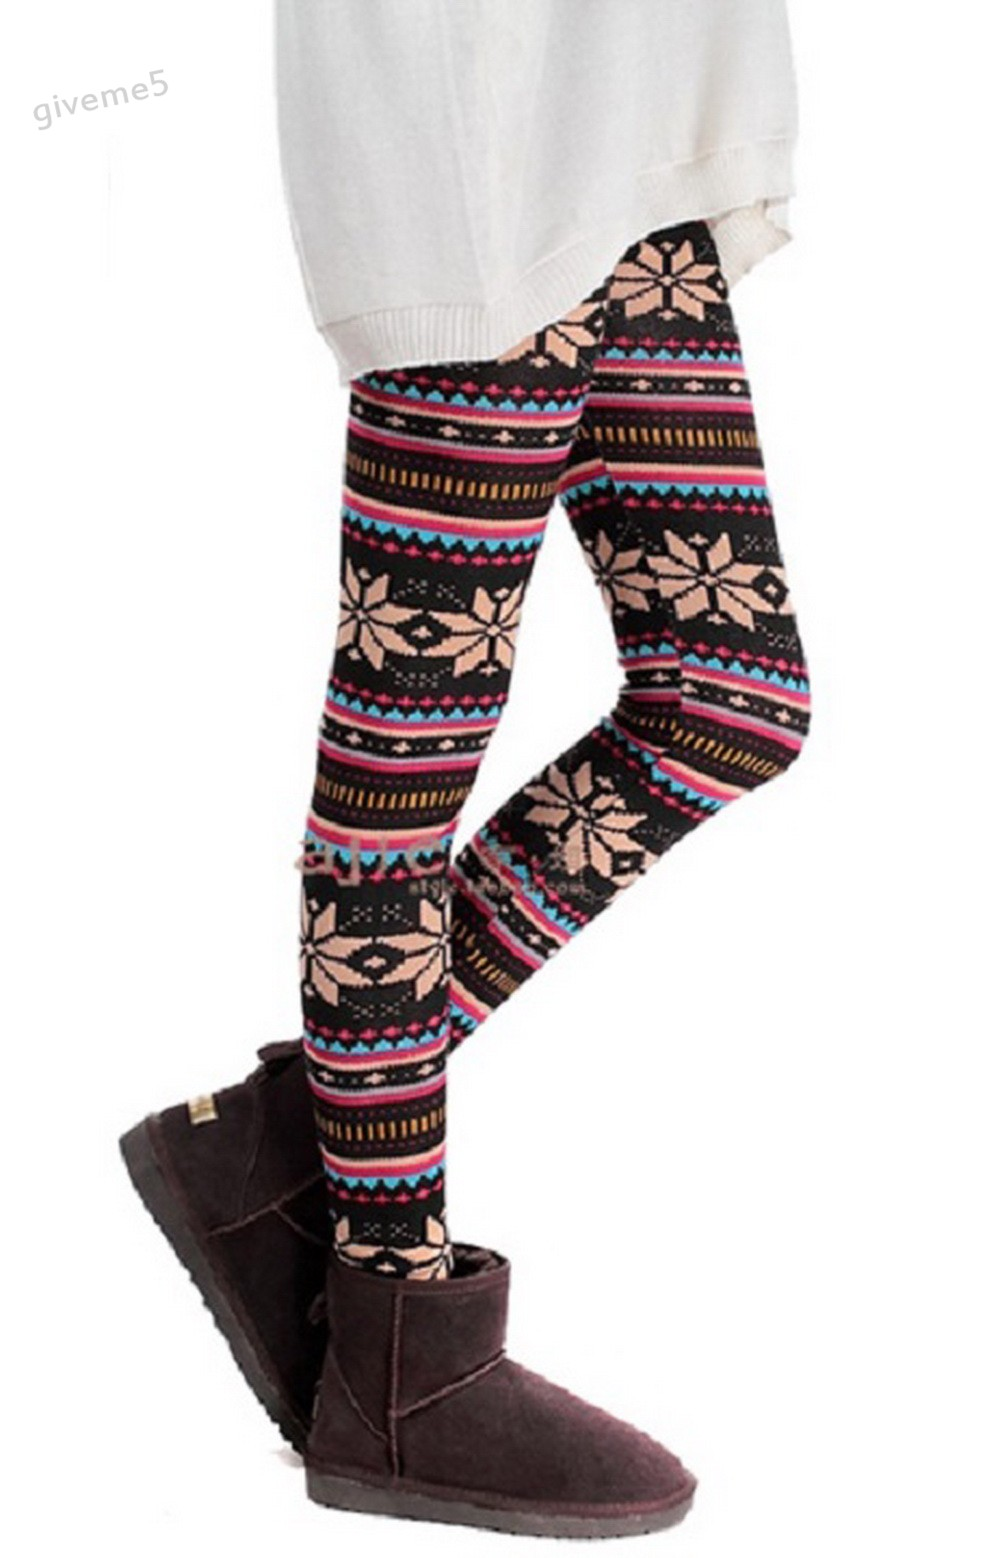 Thick Warm Winter Cotton Blends Lined Leggings Snowflakes Printed Female Slim High Elastic Thermal Fitness Skinny Leggings U2